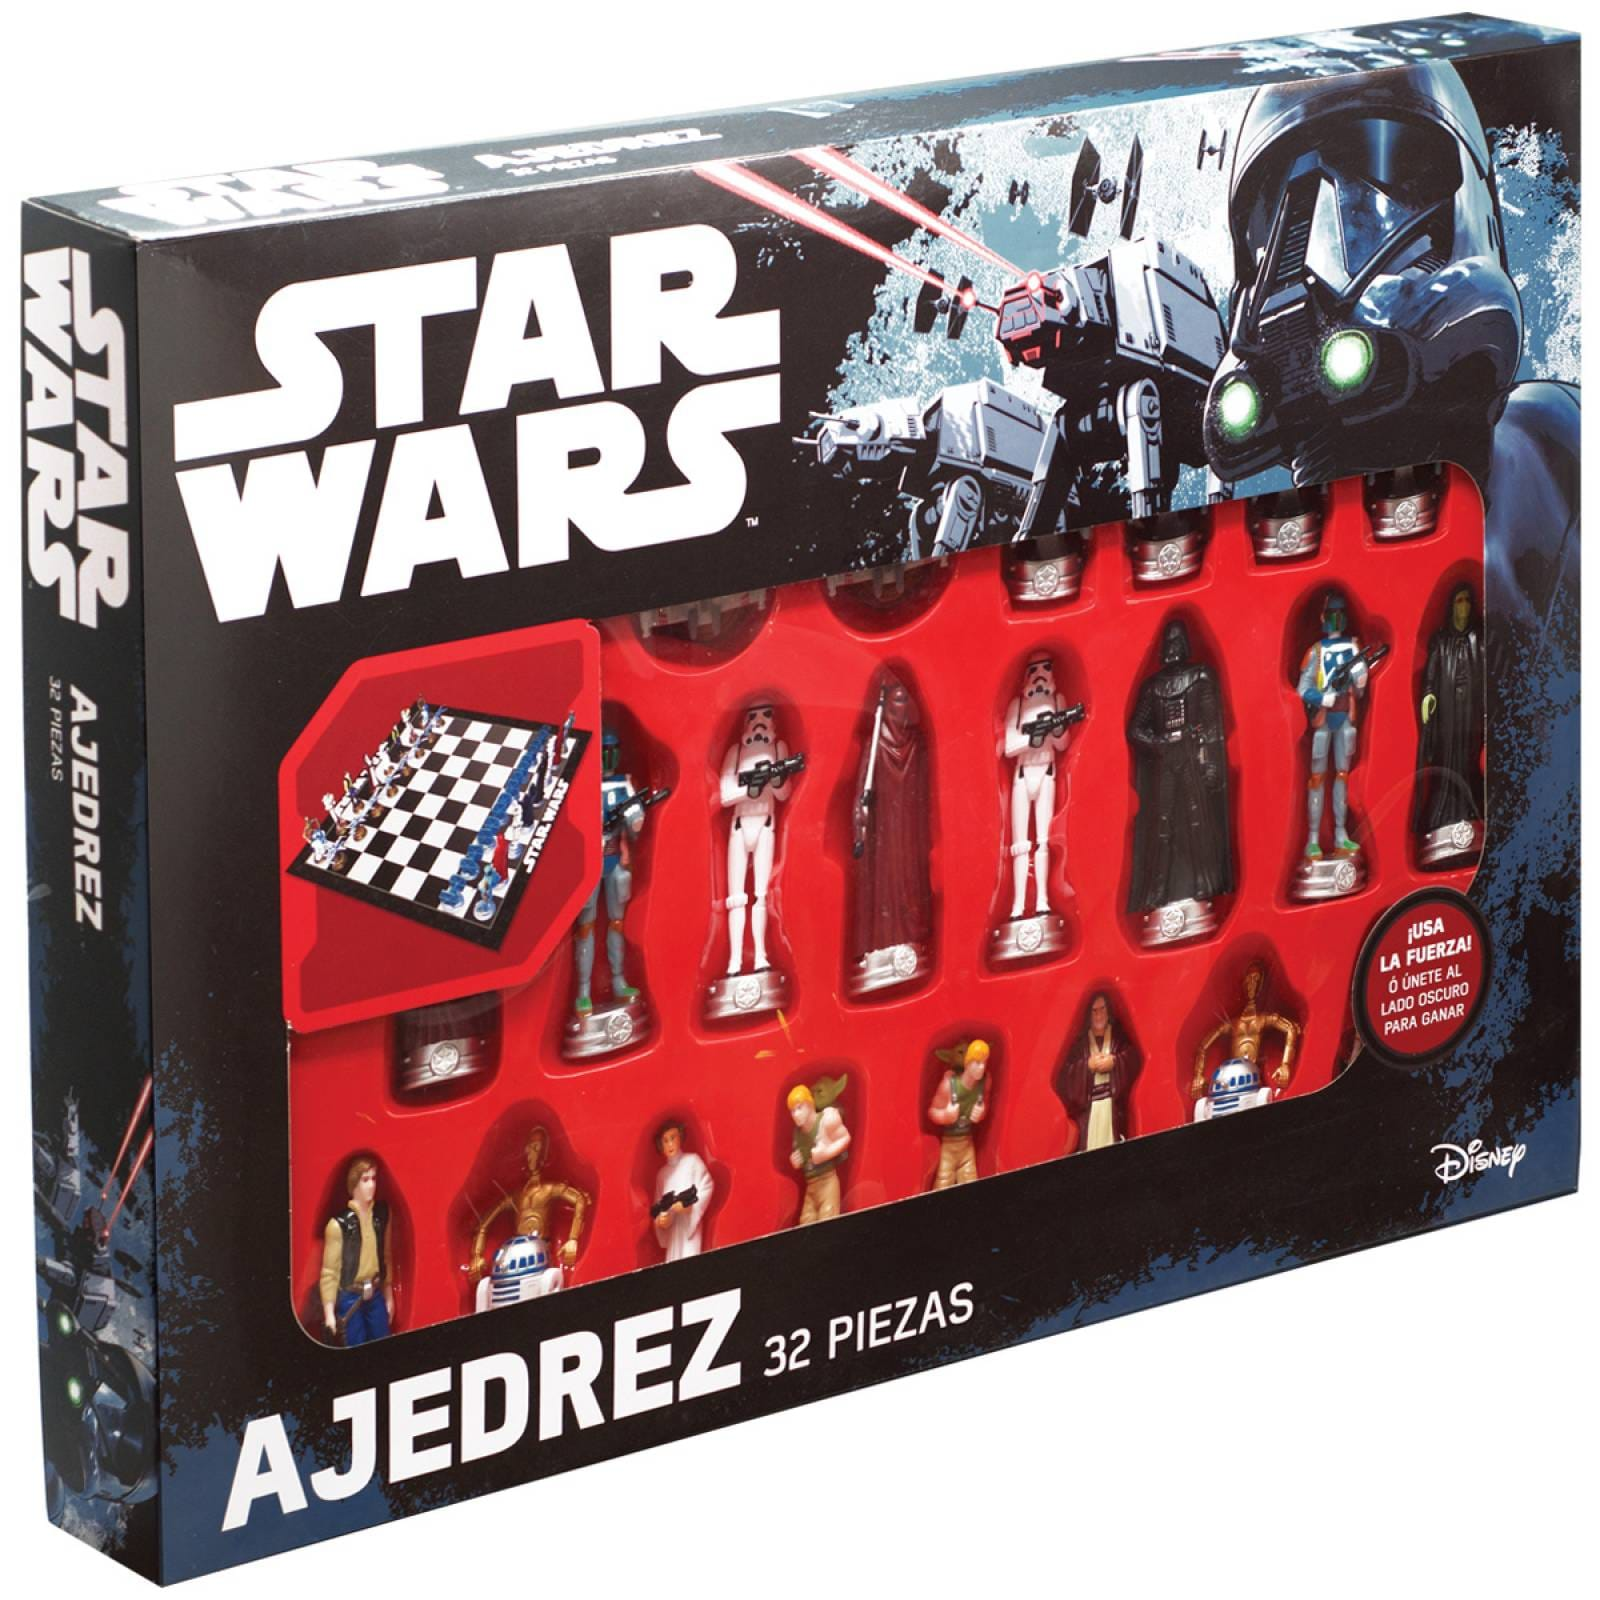 AJEDREZ STAR WARS 3D